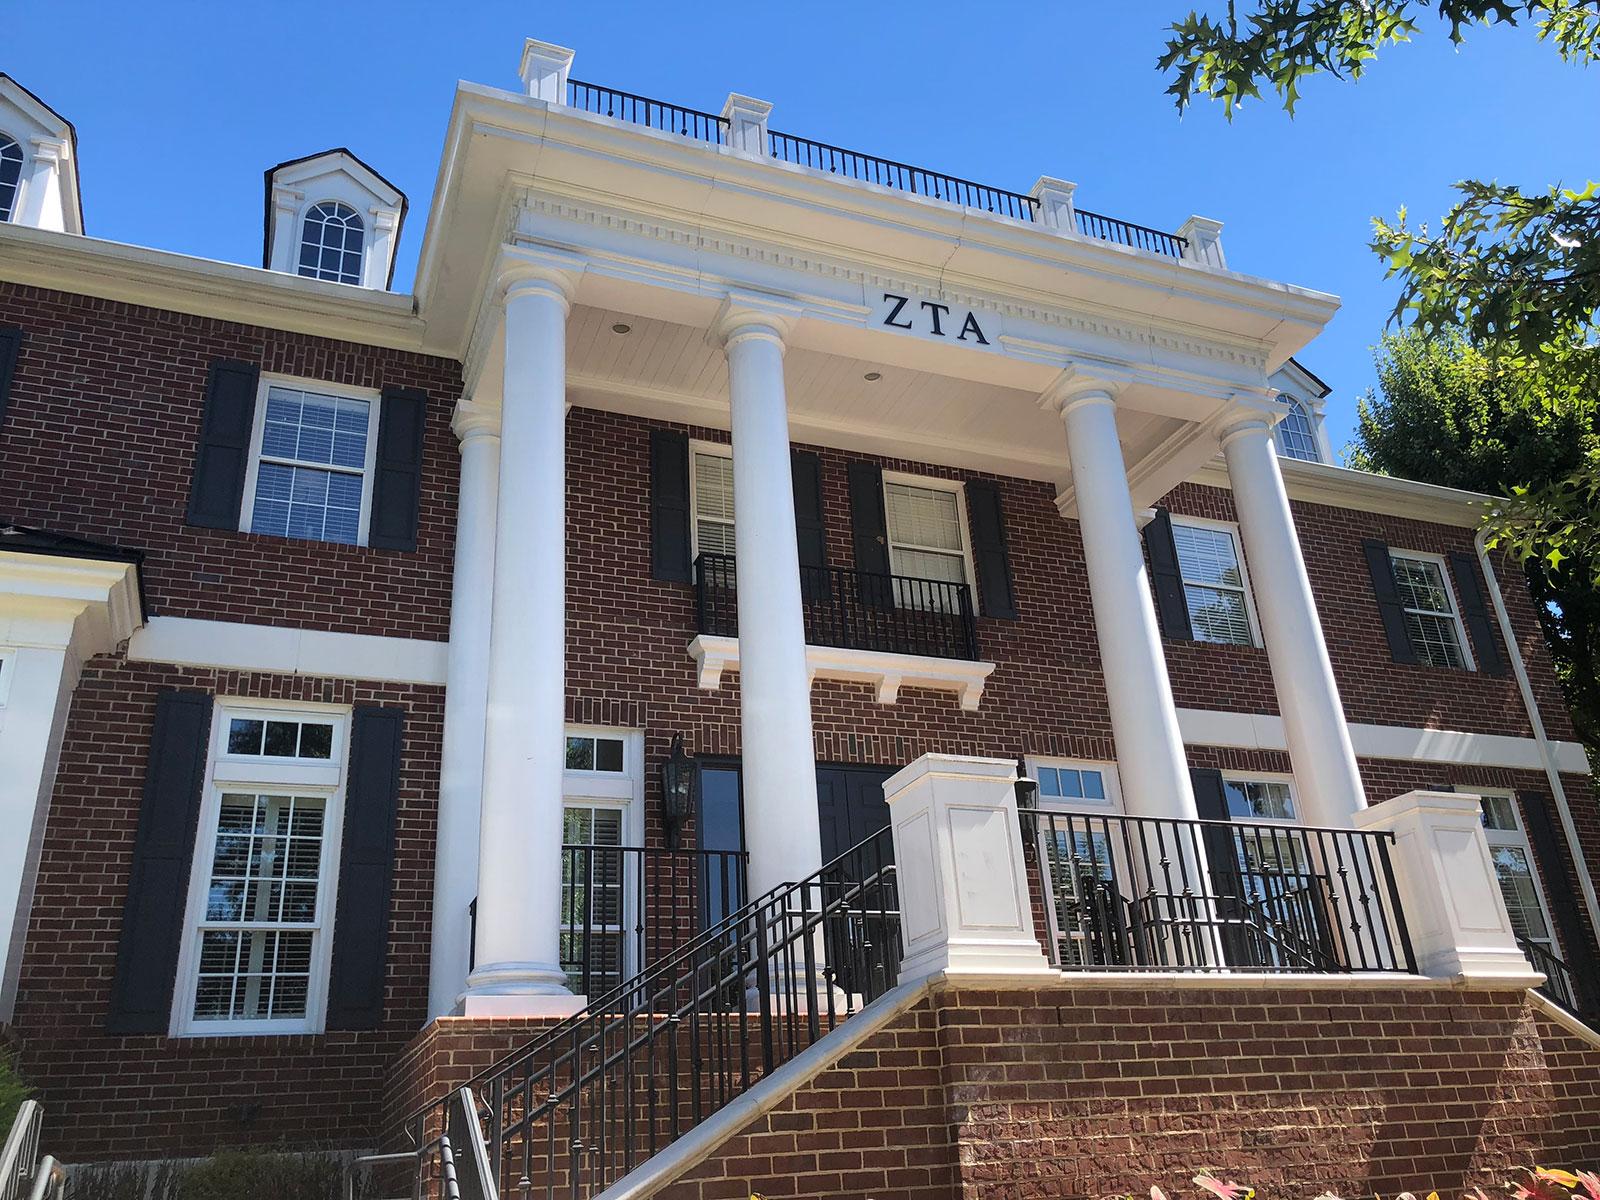 ZTA House, Georgia Tech